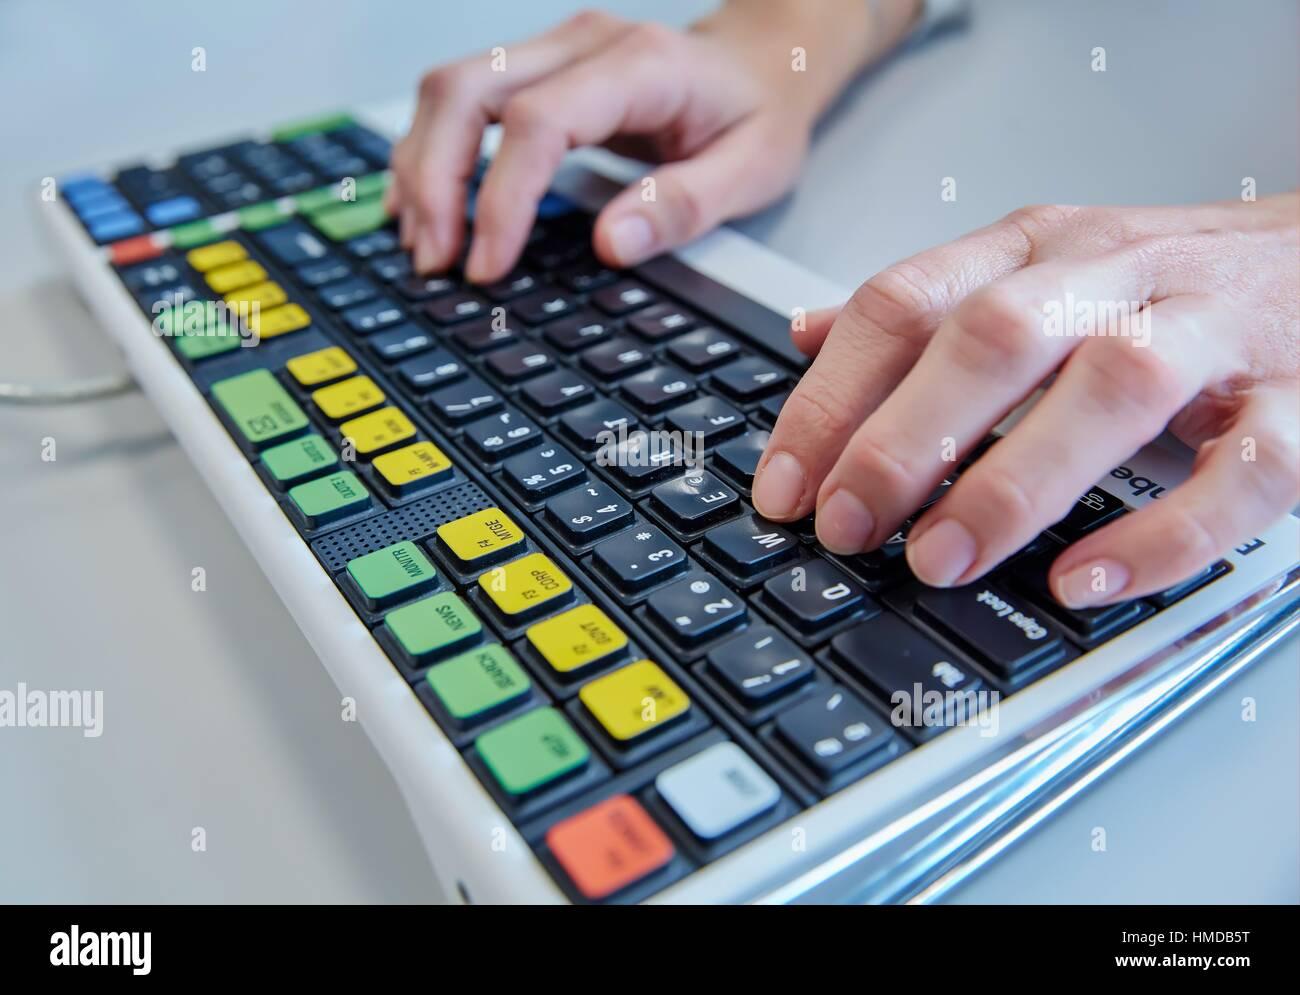 Keyboard. Stockbroker. Stock market. - Stock Image